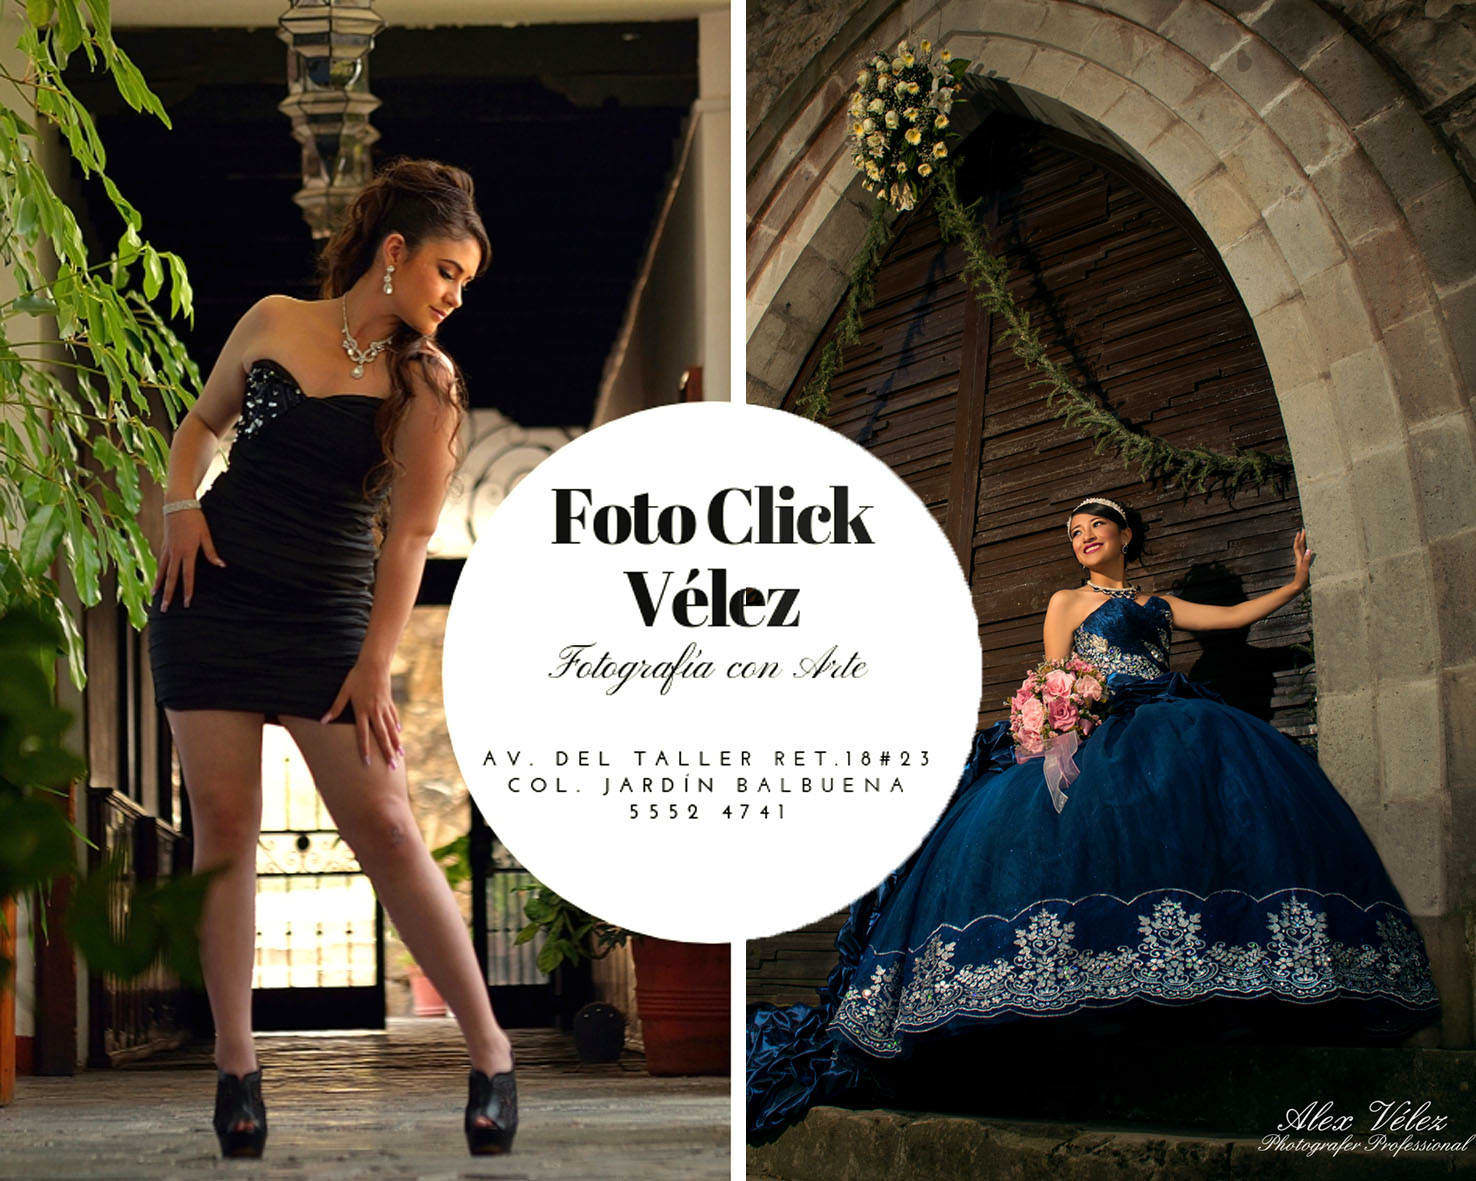 Foto Click Vélez